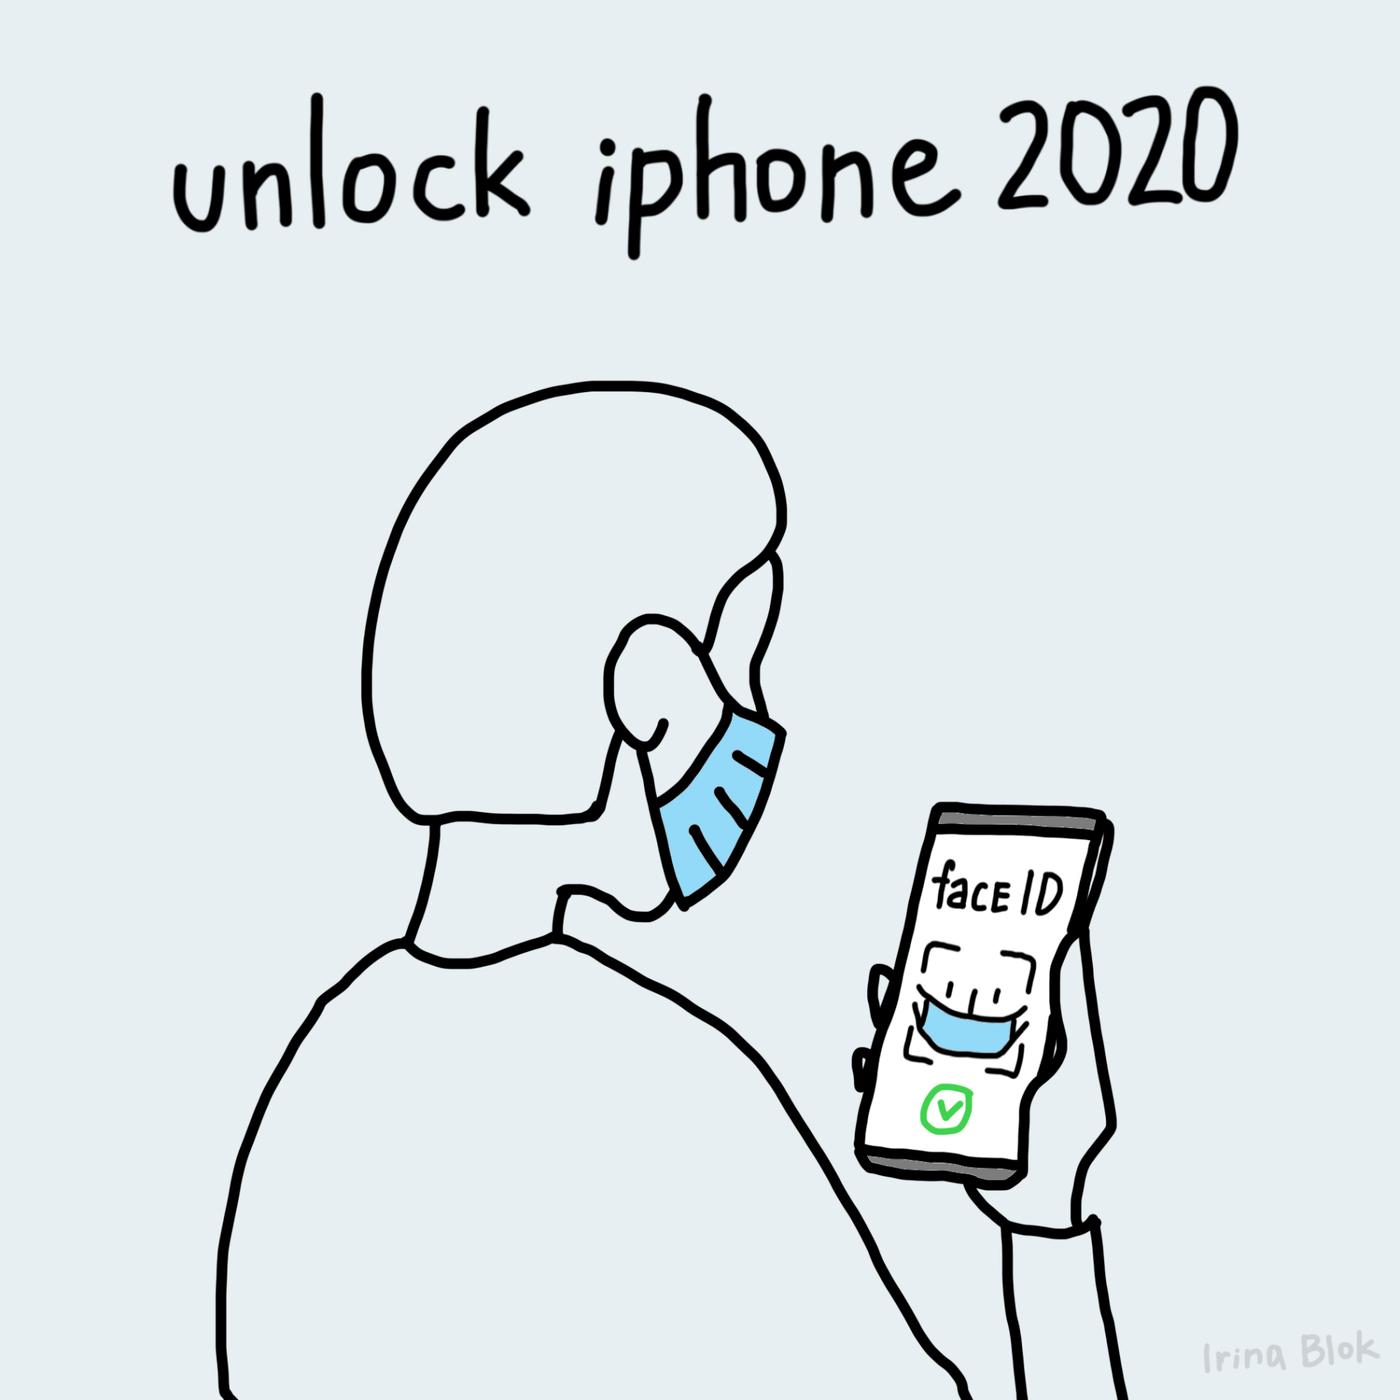 unlock iphone 2020